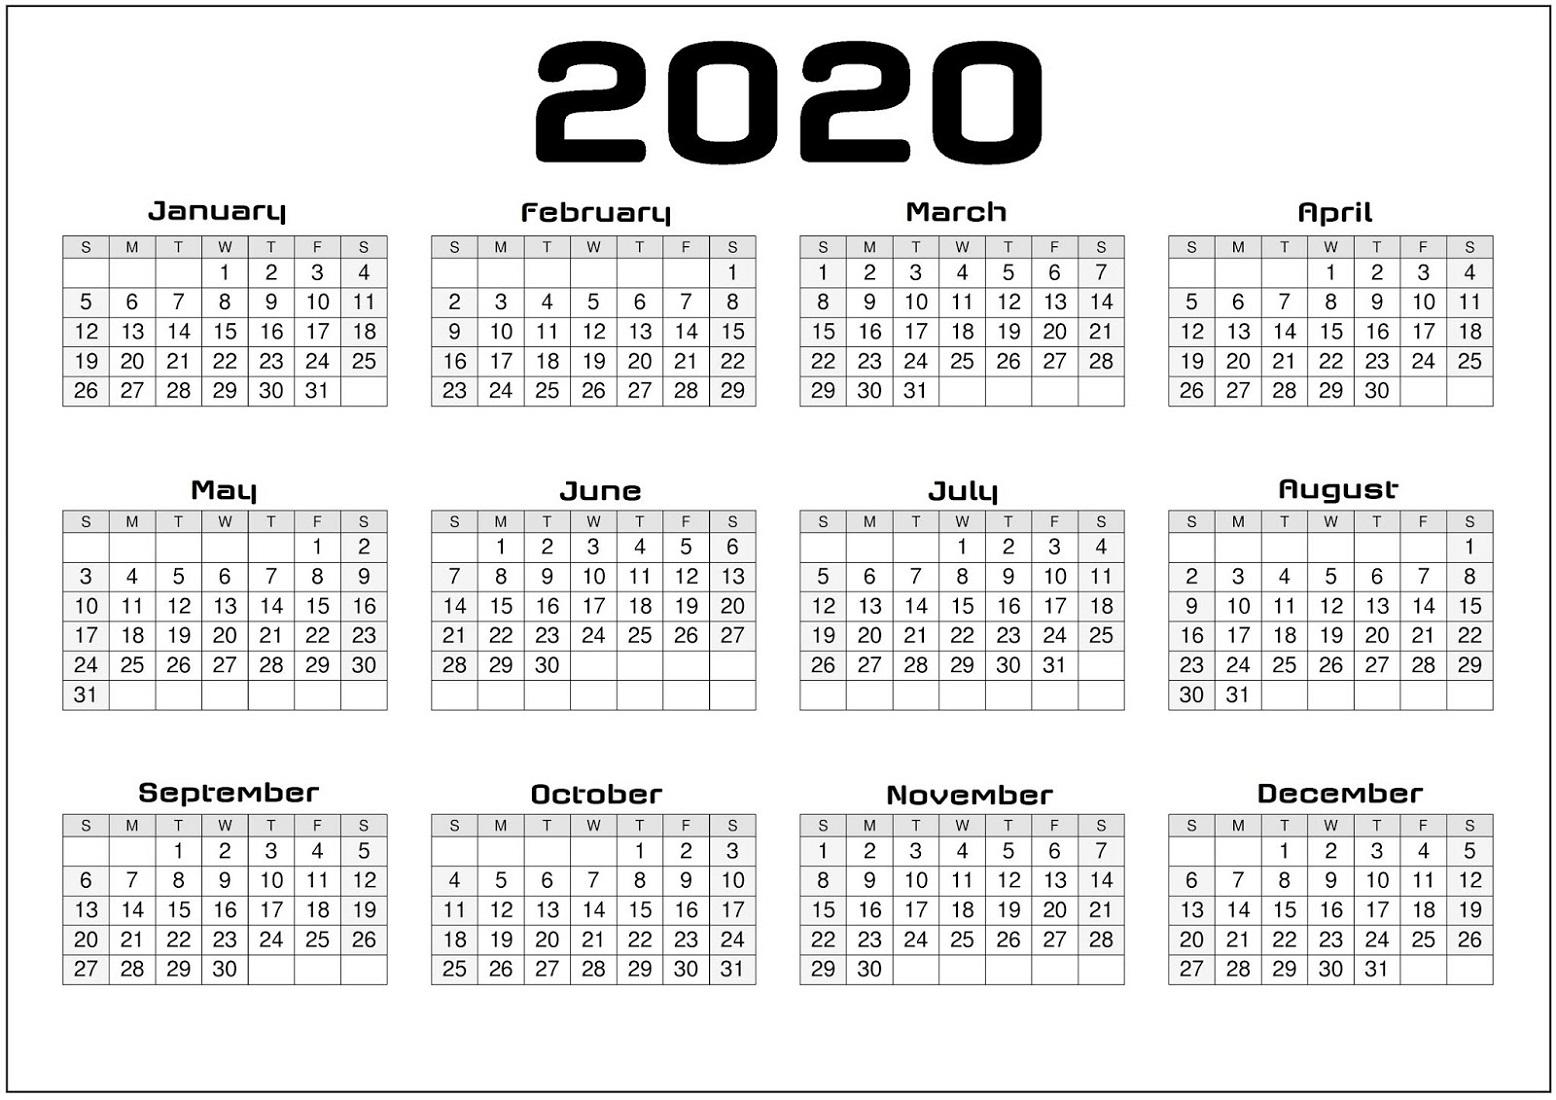 Yearly Calendar 2020 Printable Free For Agenda | Calendar